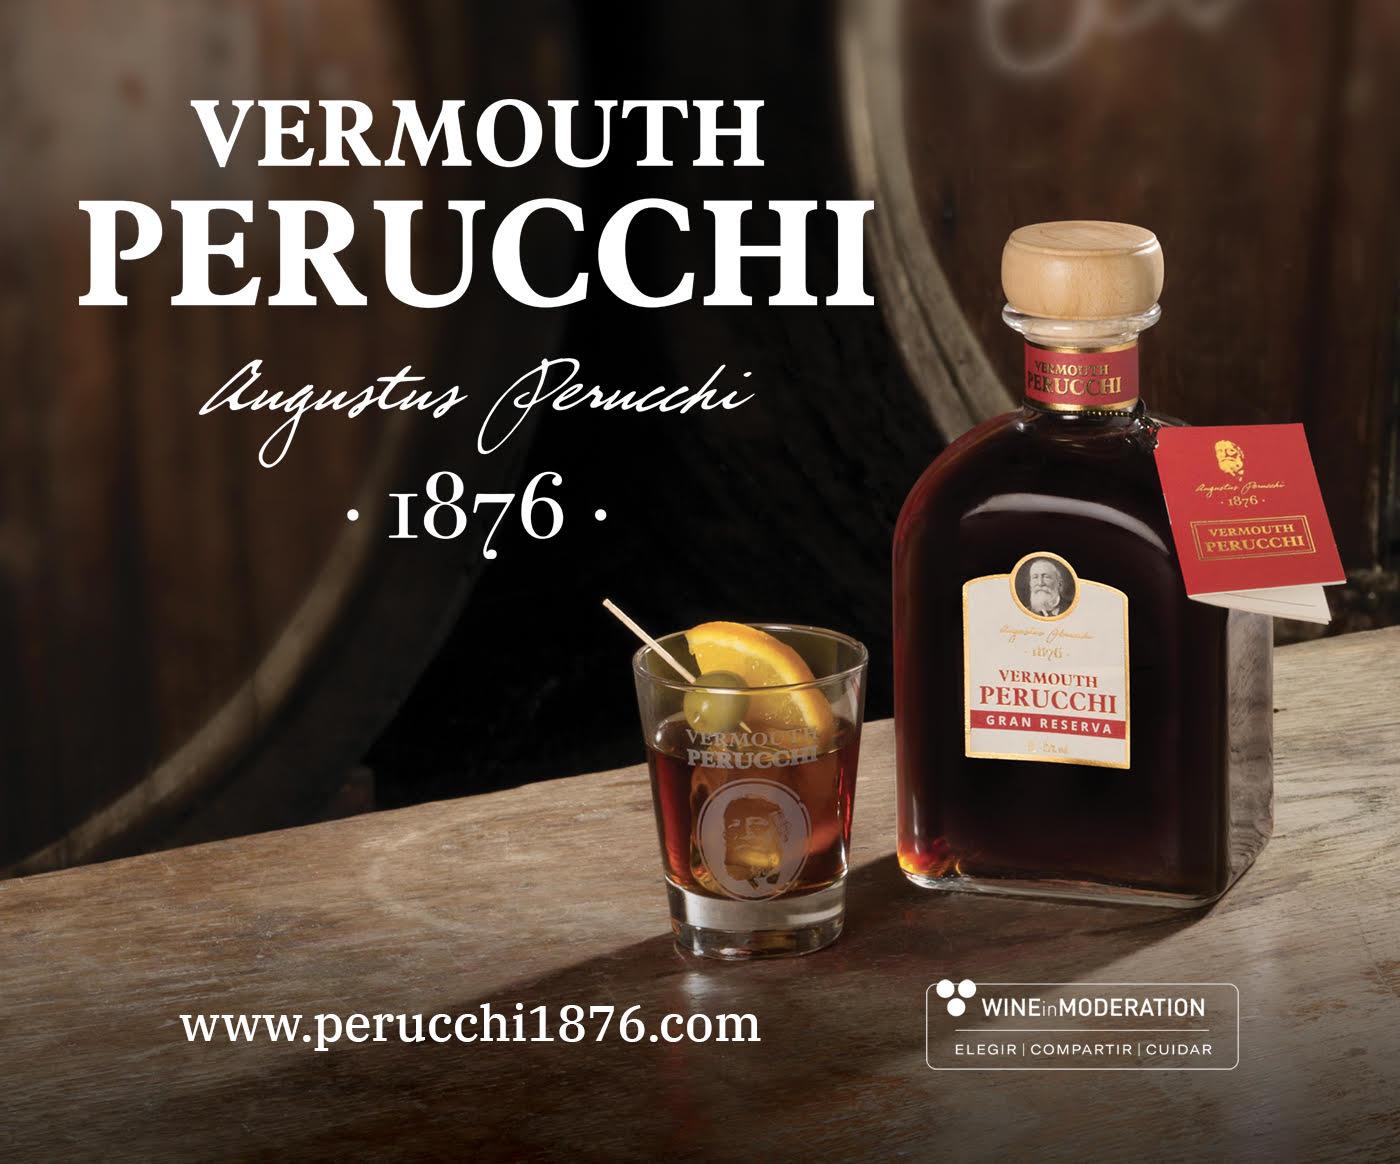 banenr-vermouth-perucchi